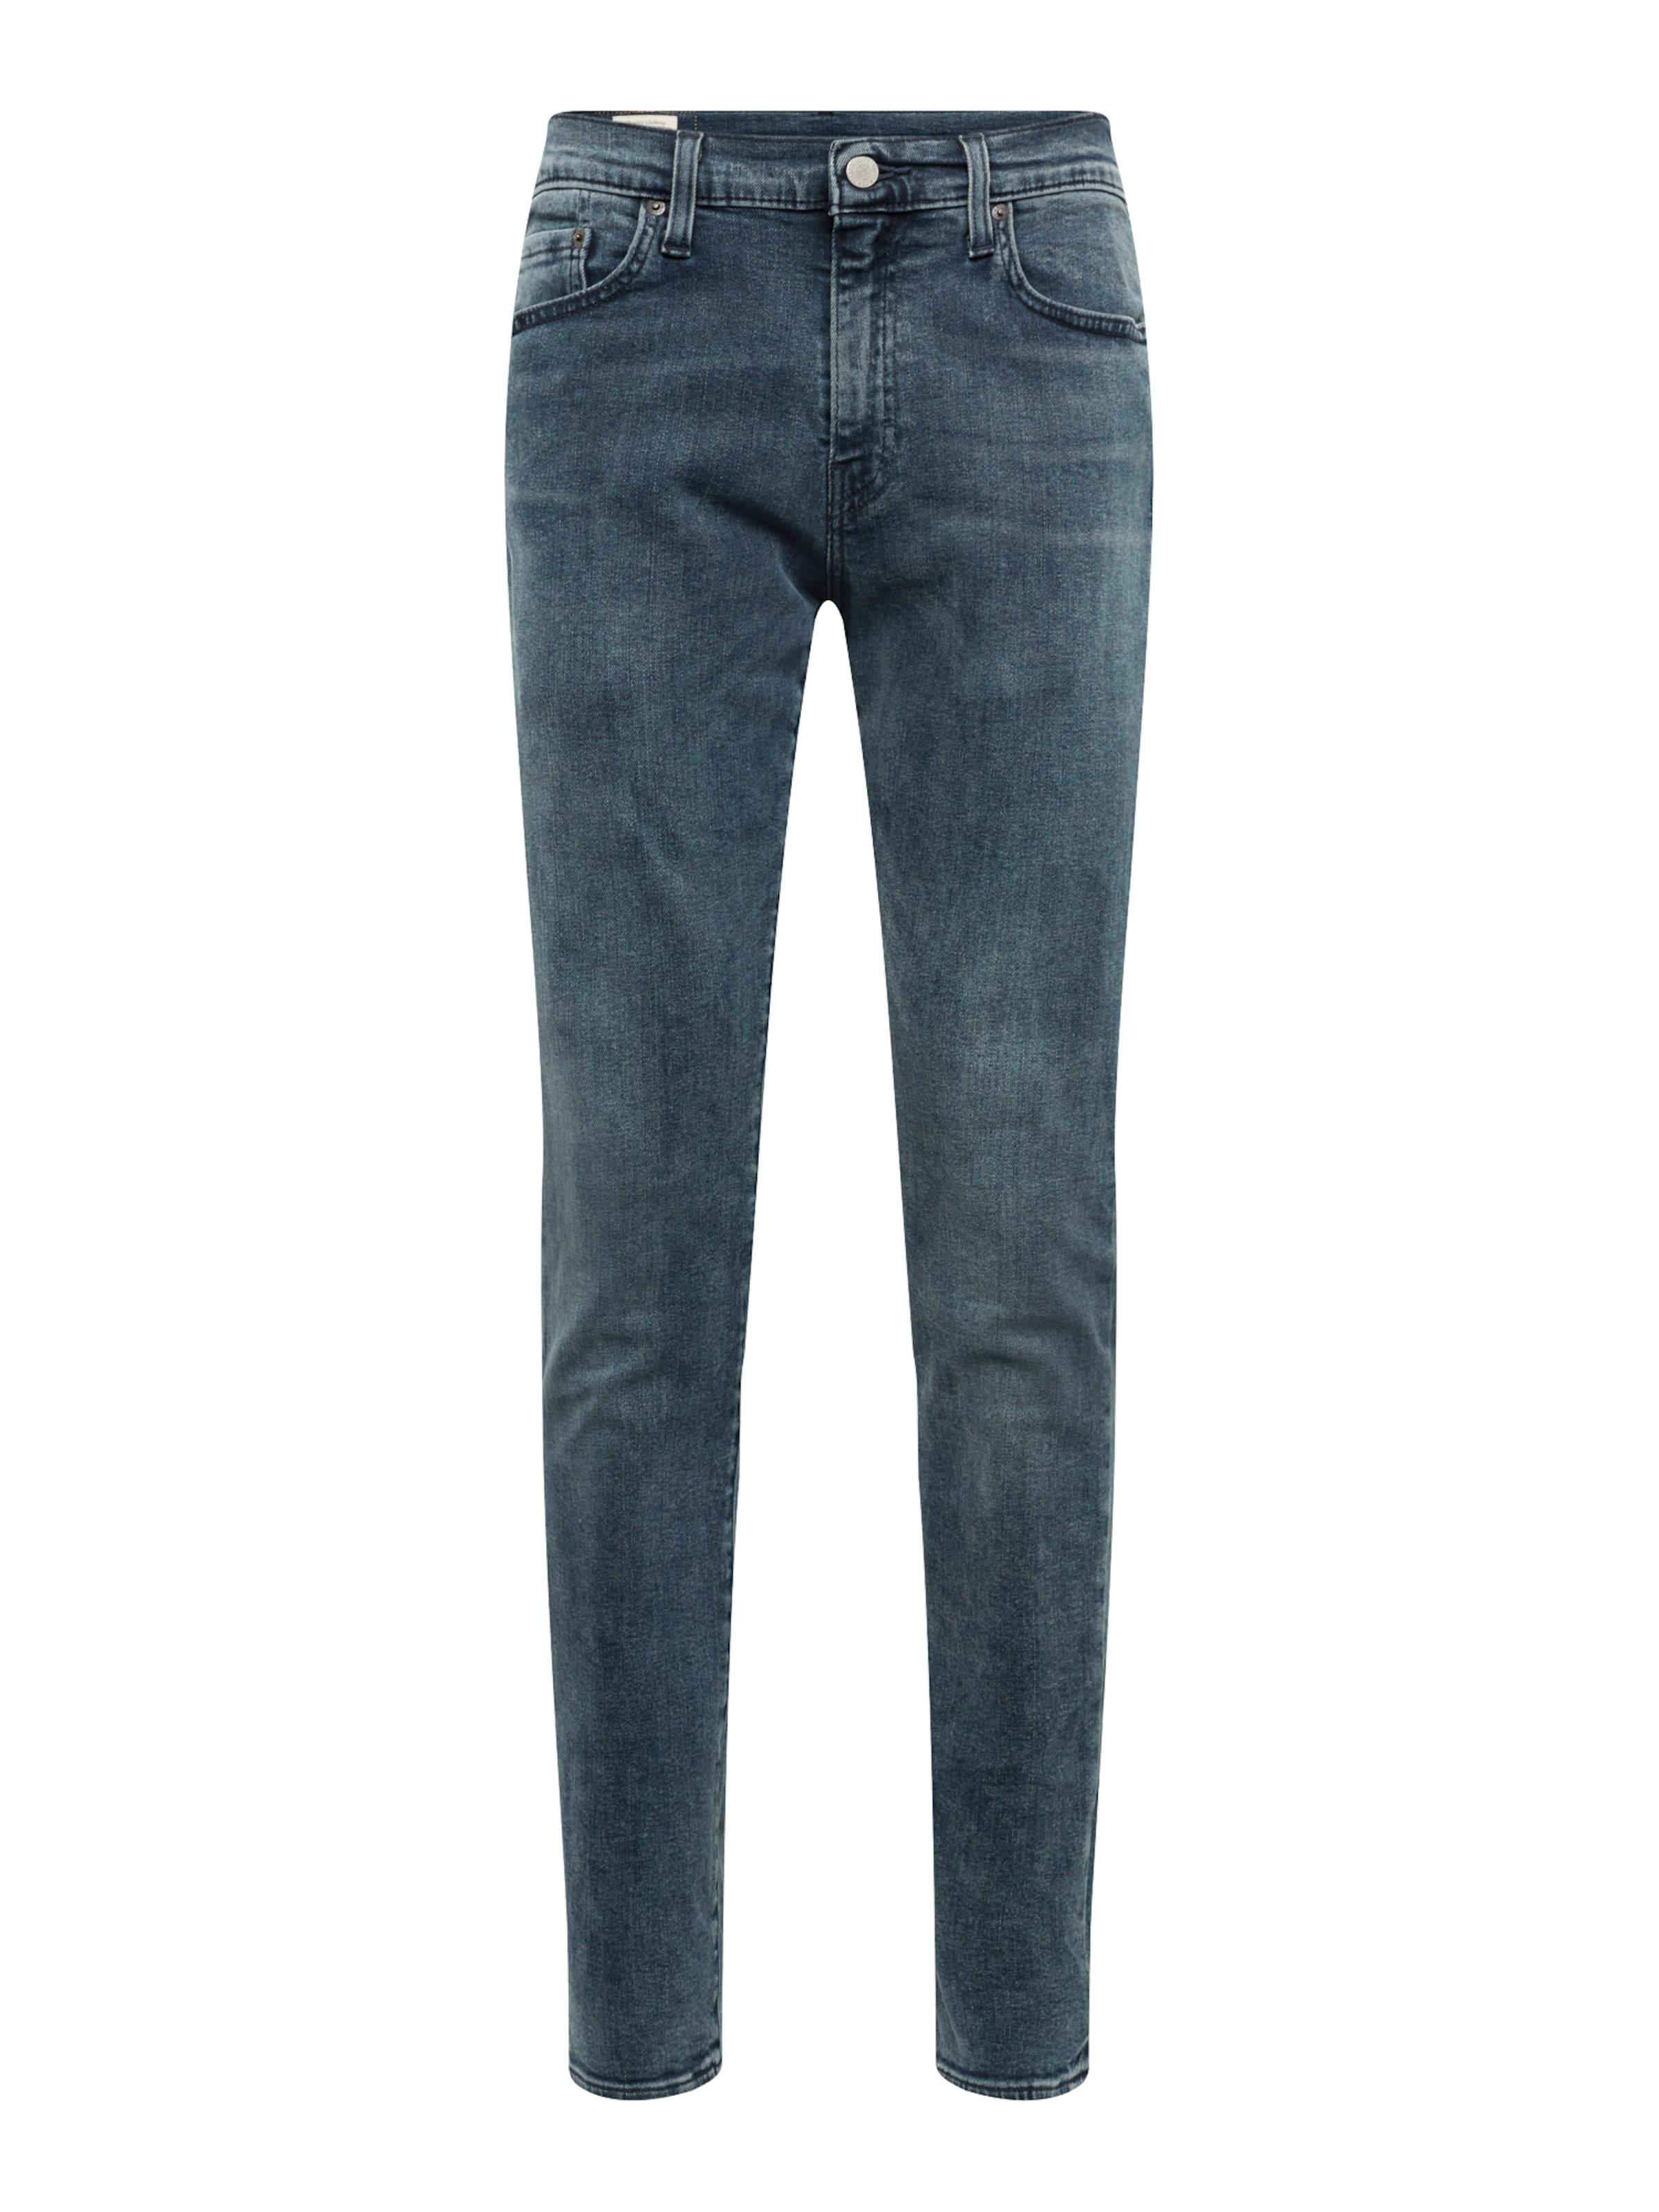 Taubenblau '511' Jeans Levi's In fgY67yb